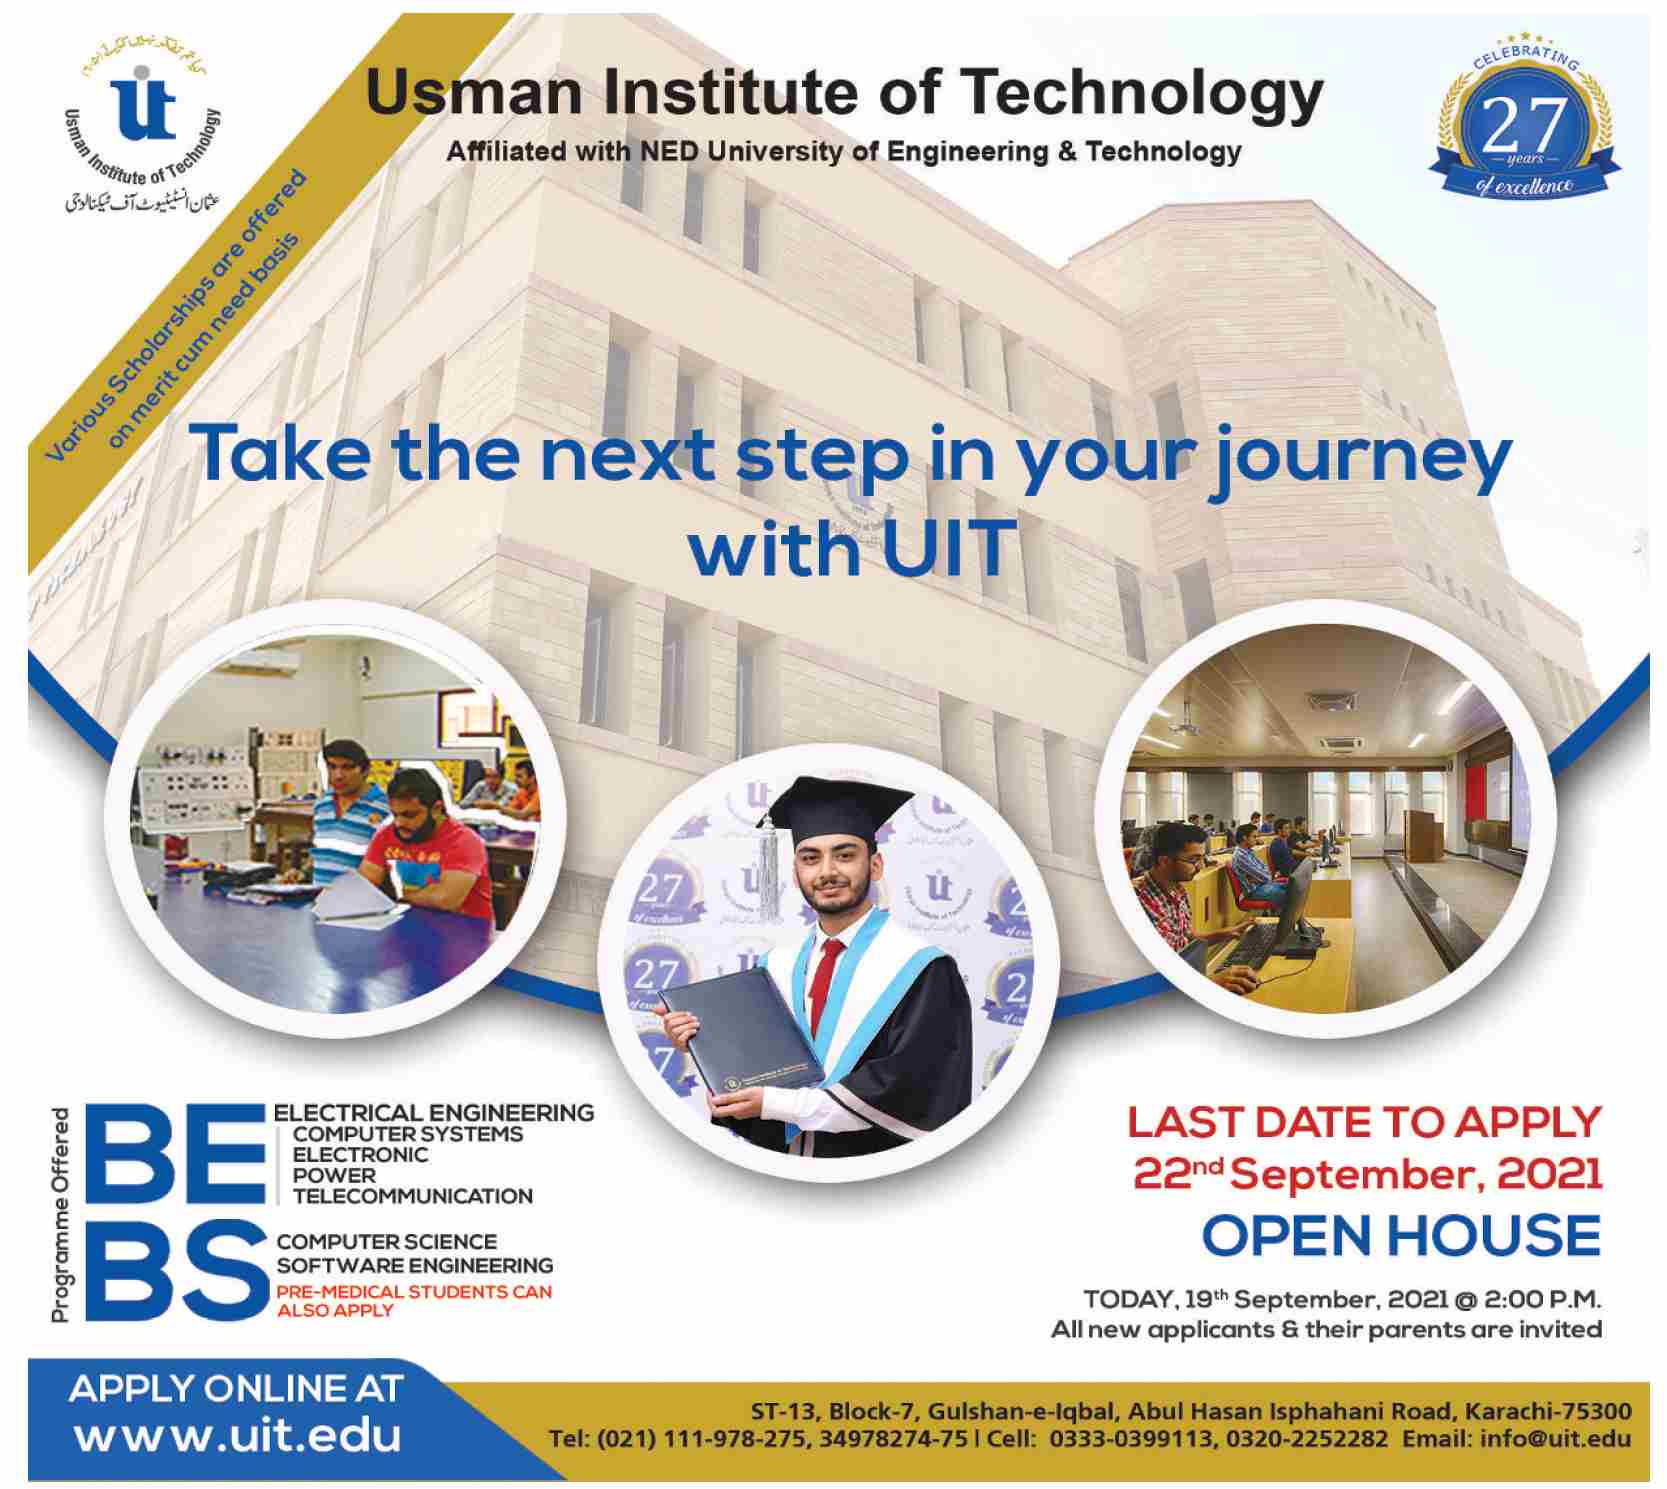 Usman Institute Of Technology UIT Admission 2021 Online Form